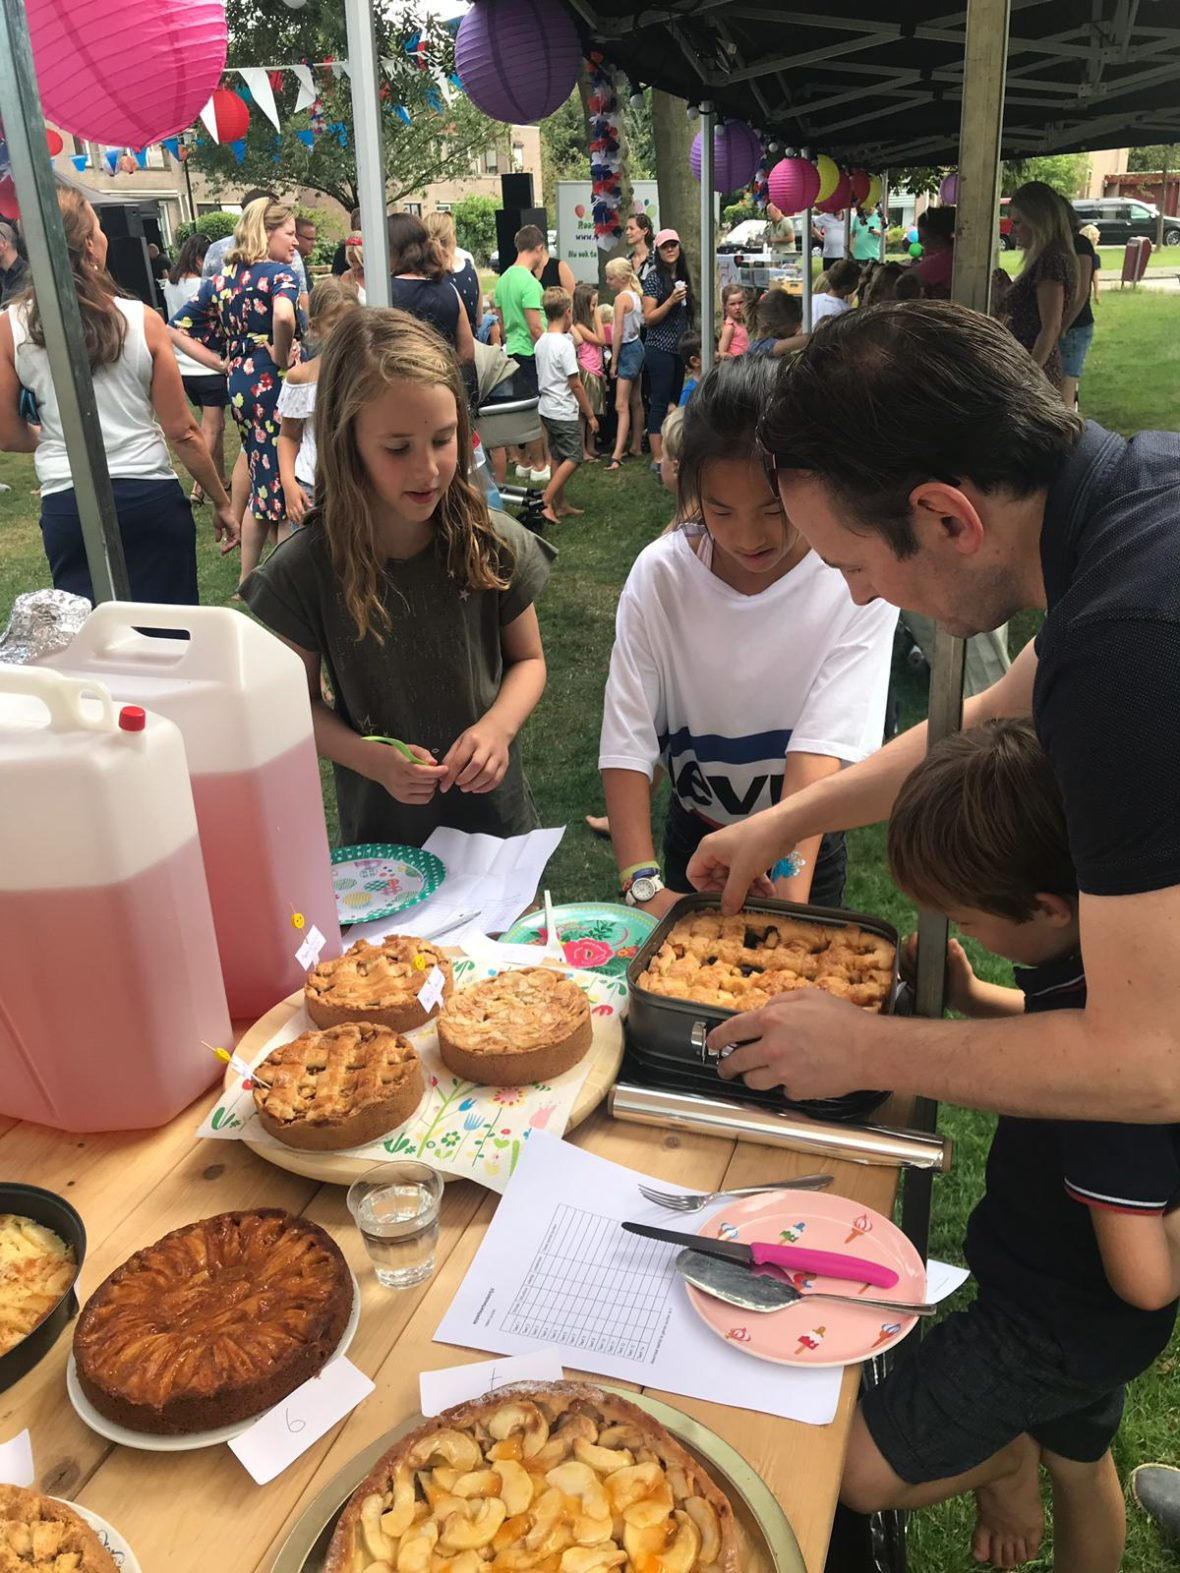 31-08-2019: Buurtbarbecue Tulpentuin & Rozentuin 2019